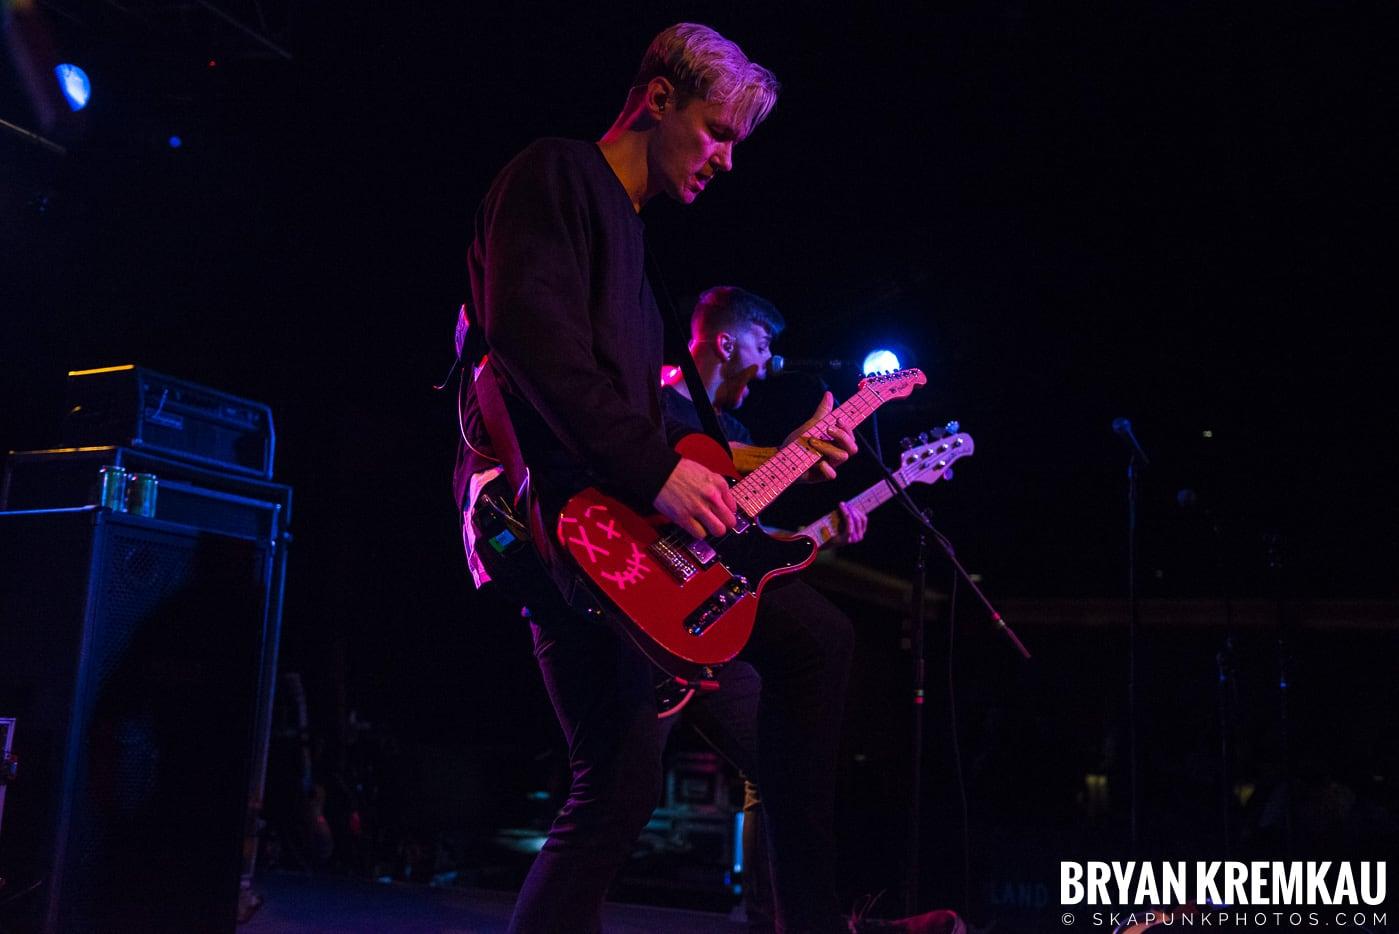 Ballyhoo! @ Starland Ballroom, Sayreville, NJ - 11.23.18 (5)